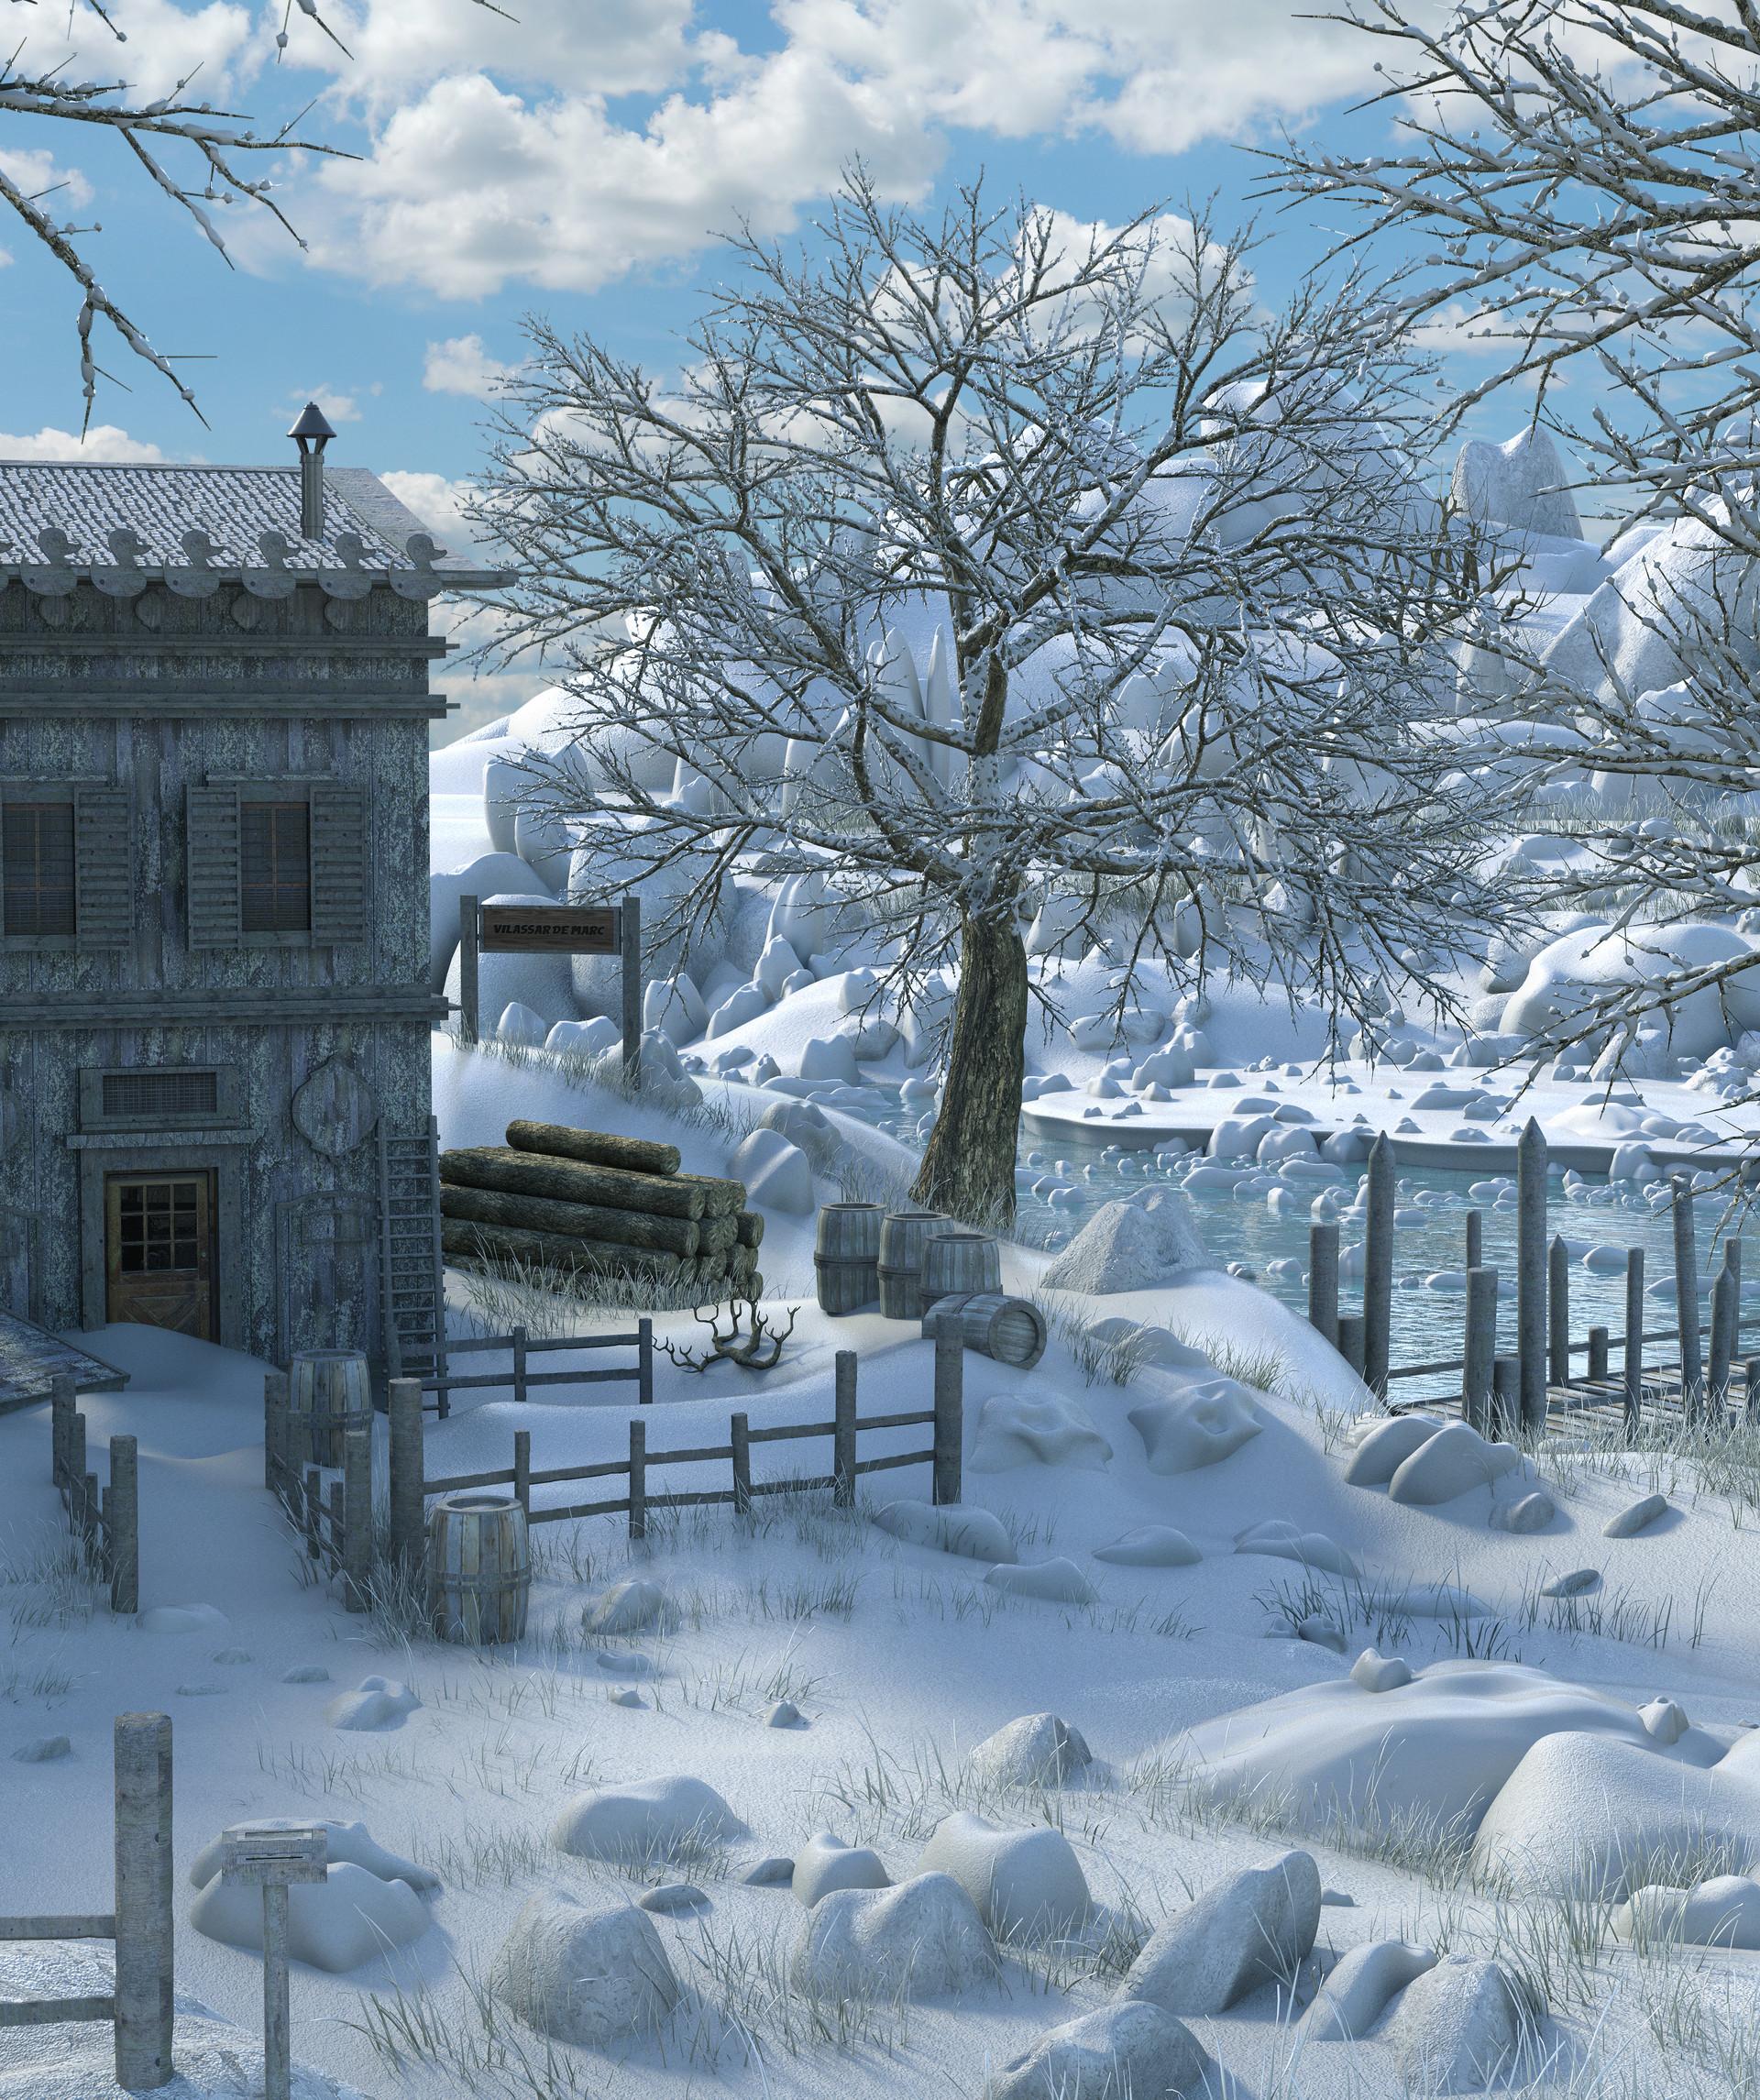 Marc mons snow4